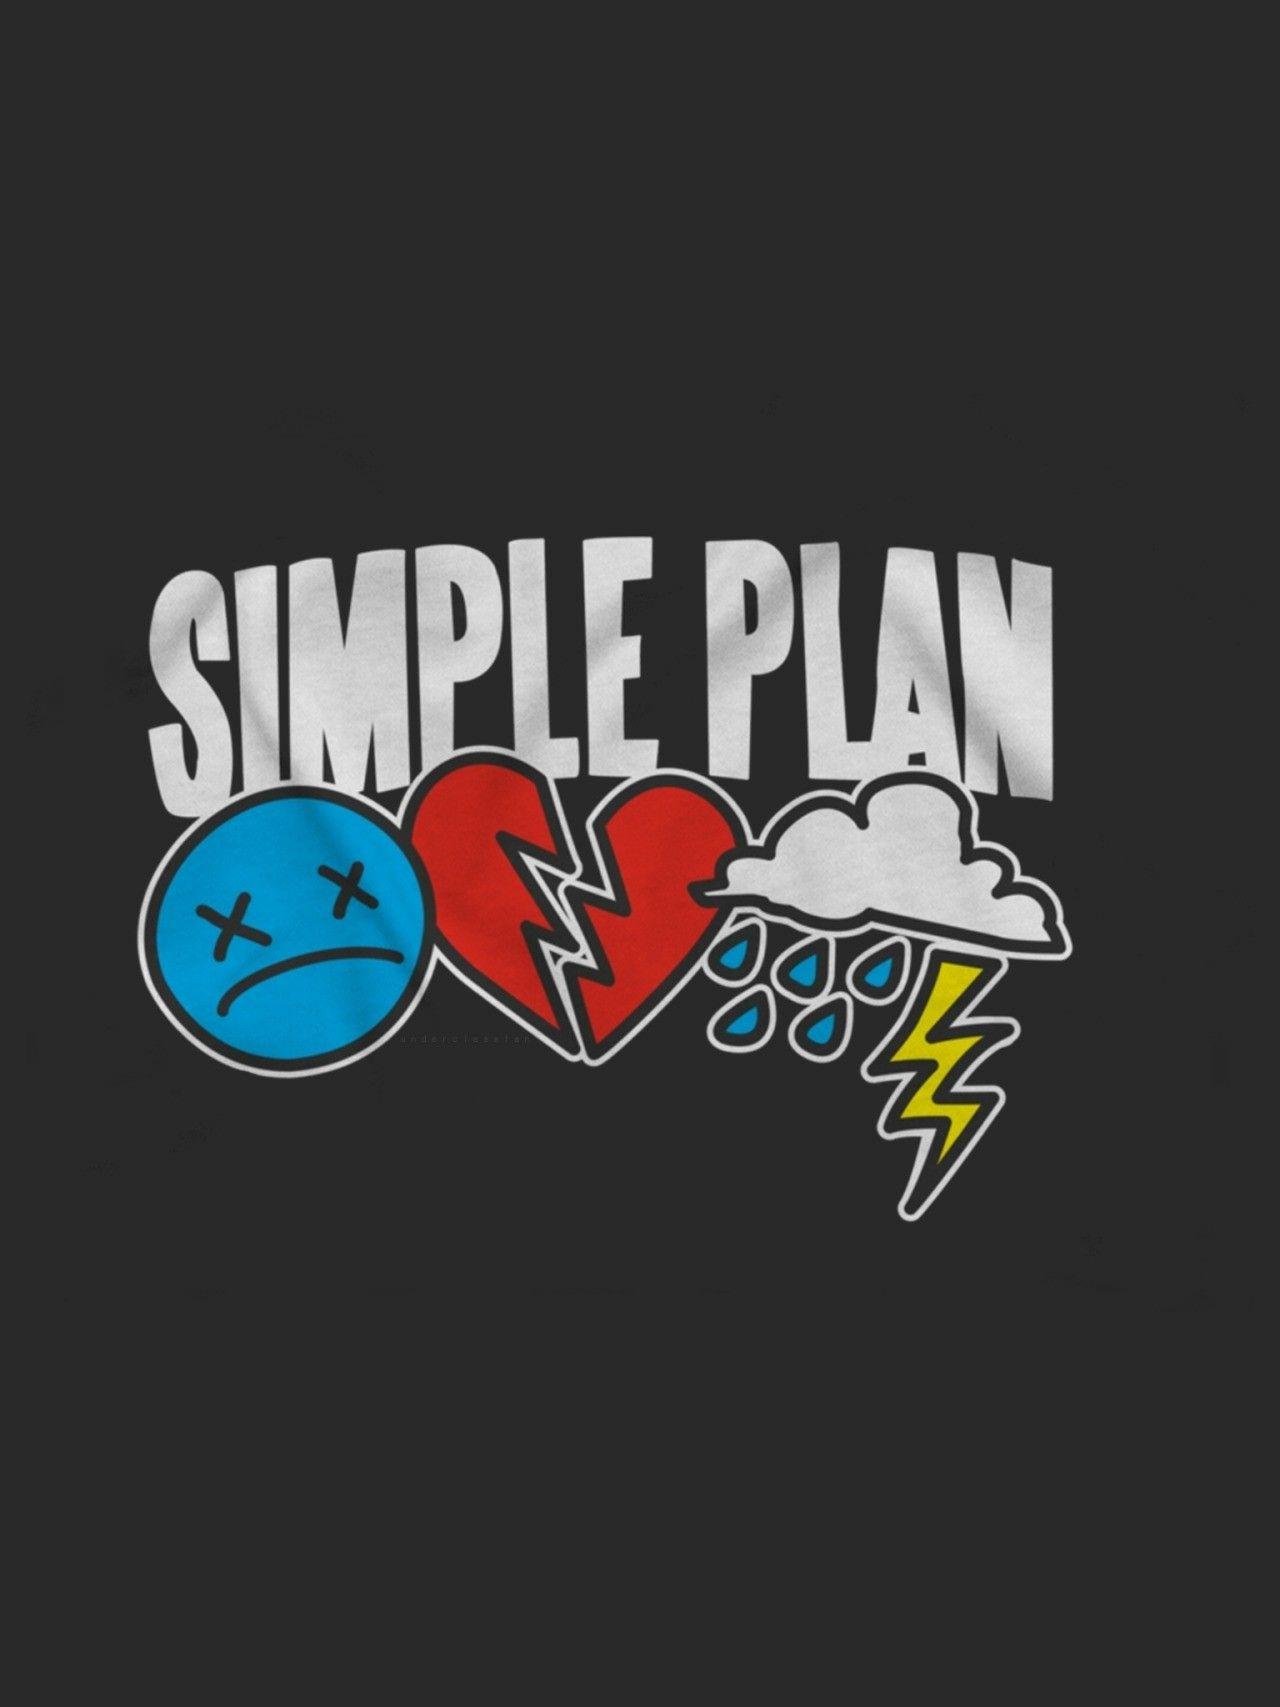 Pin By Alex Marie On Simple Plan Band Wallpapers Simple Plan Lyrics Band Logos